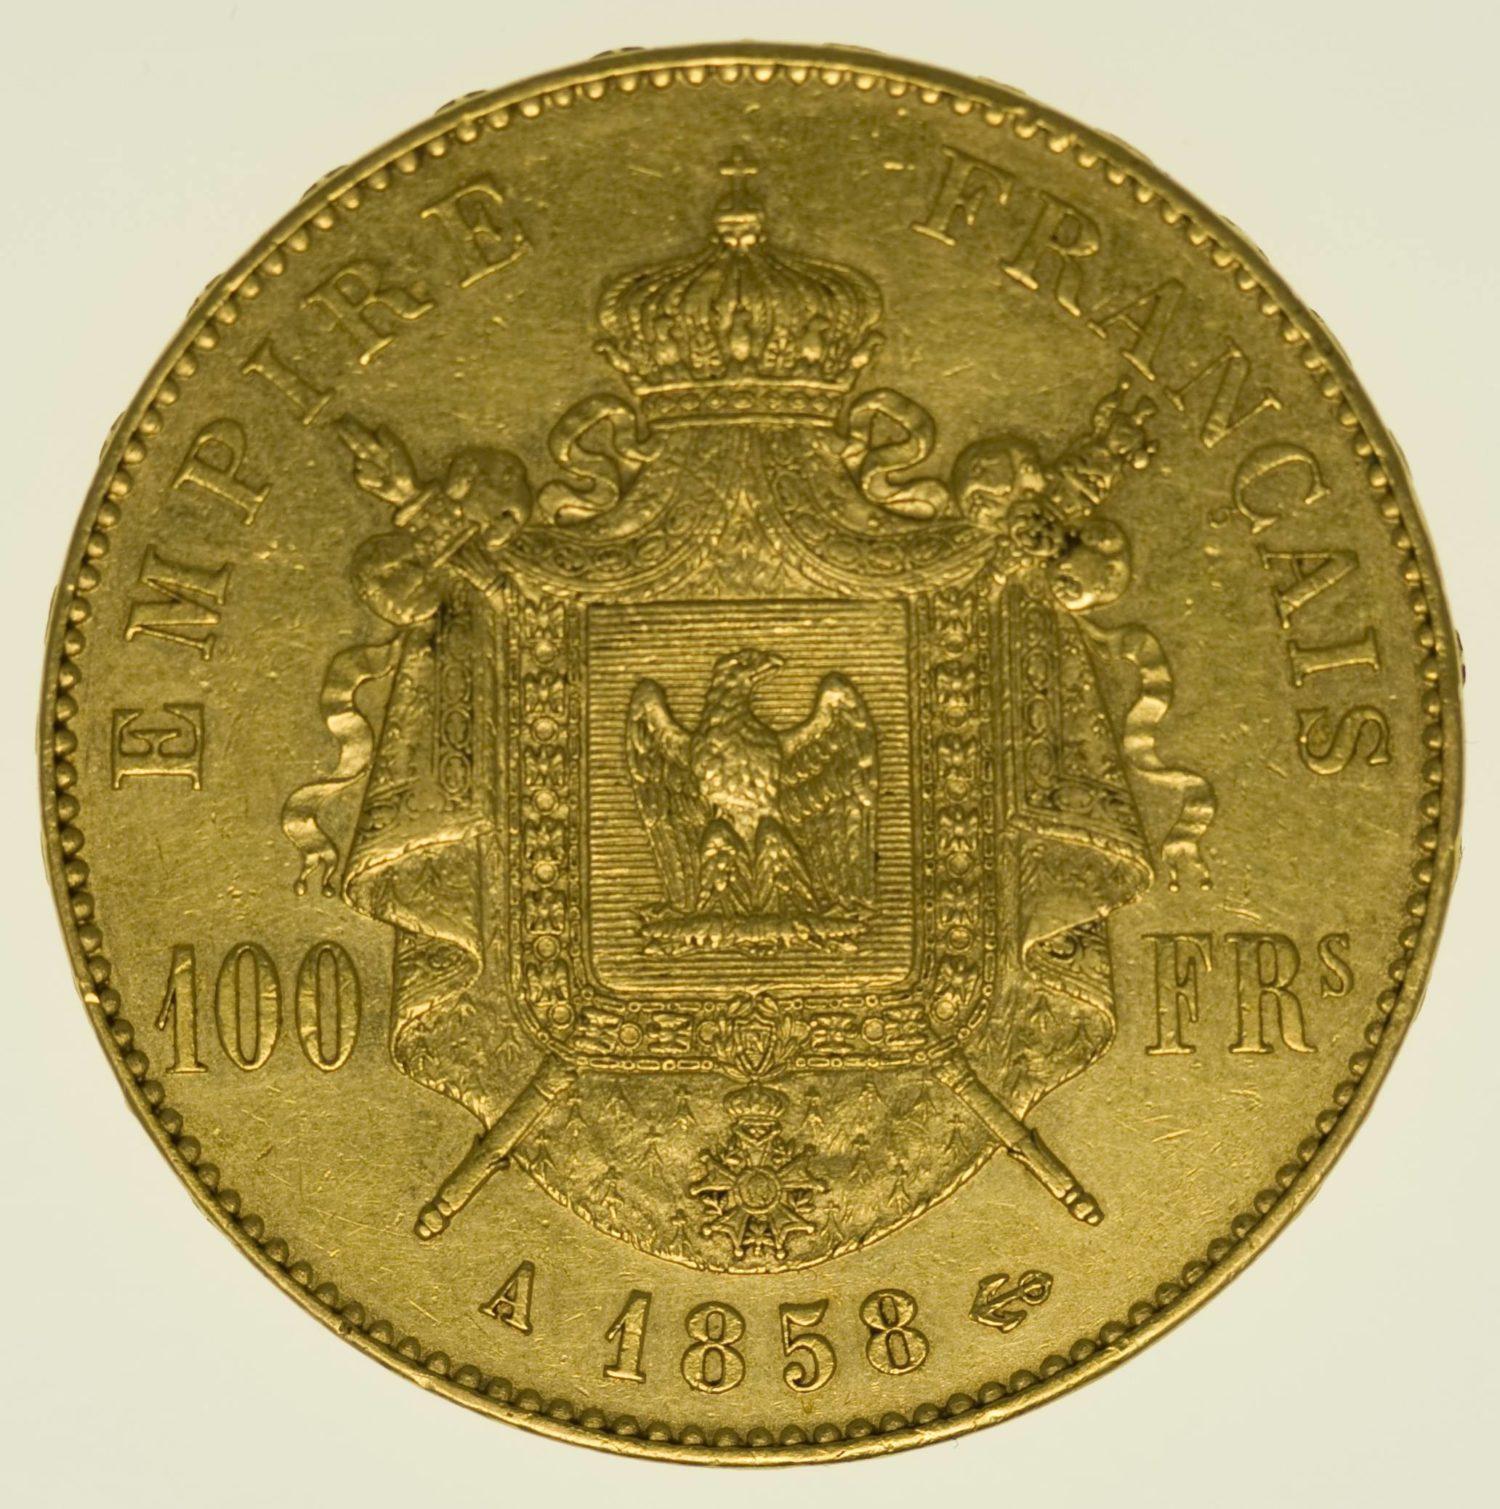 Frankreich Napoleon III. ohne Kranz 100 Francs 1858 A Gold 29,03 Gramm fein RAR